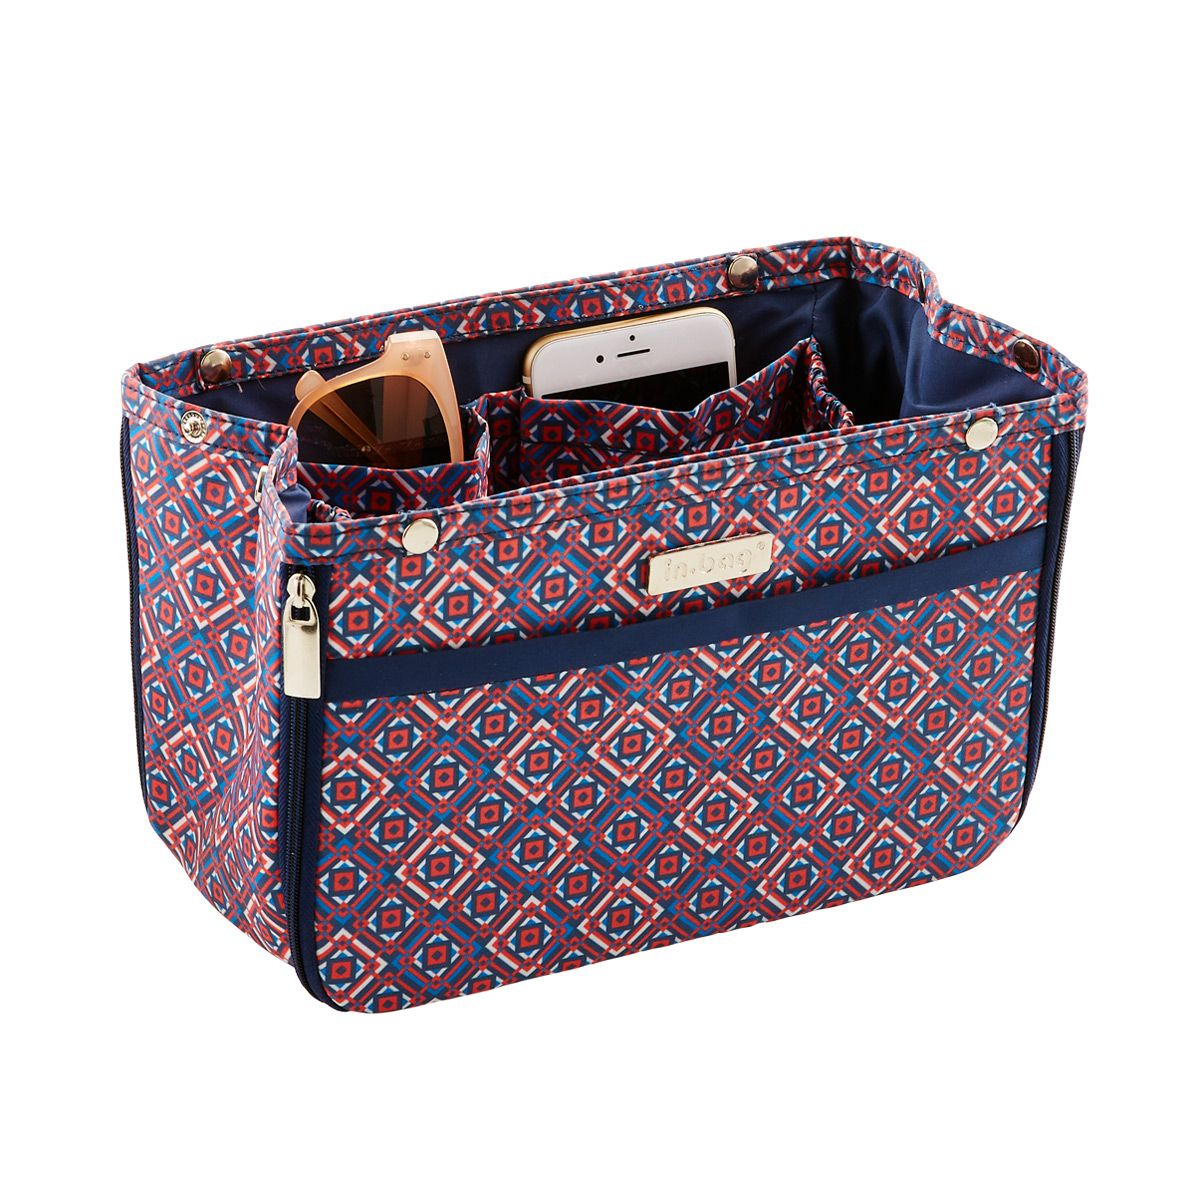 6 Best Handbag Organizers Purse